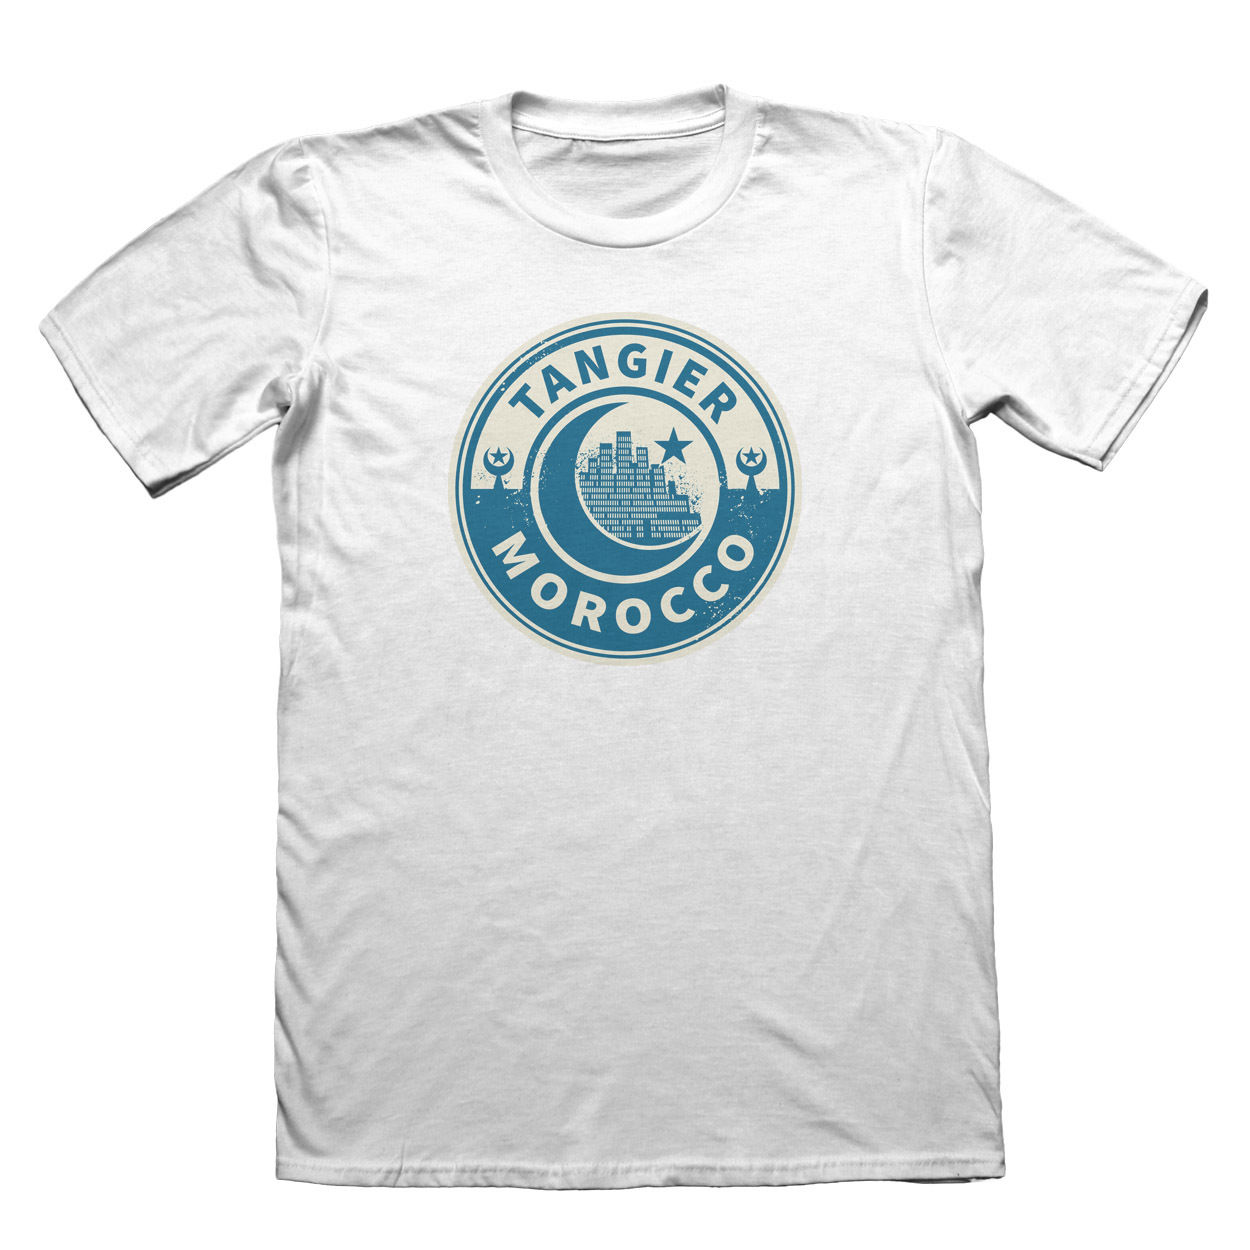 Morocco Tangier T-Shirt - Mens Fathers Day Christmas Gift Cotton T-Shirt Fashion T Shirt top tee